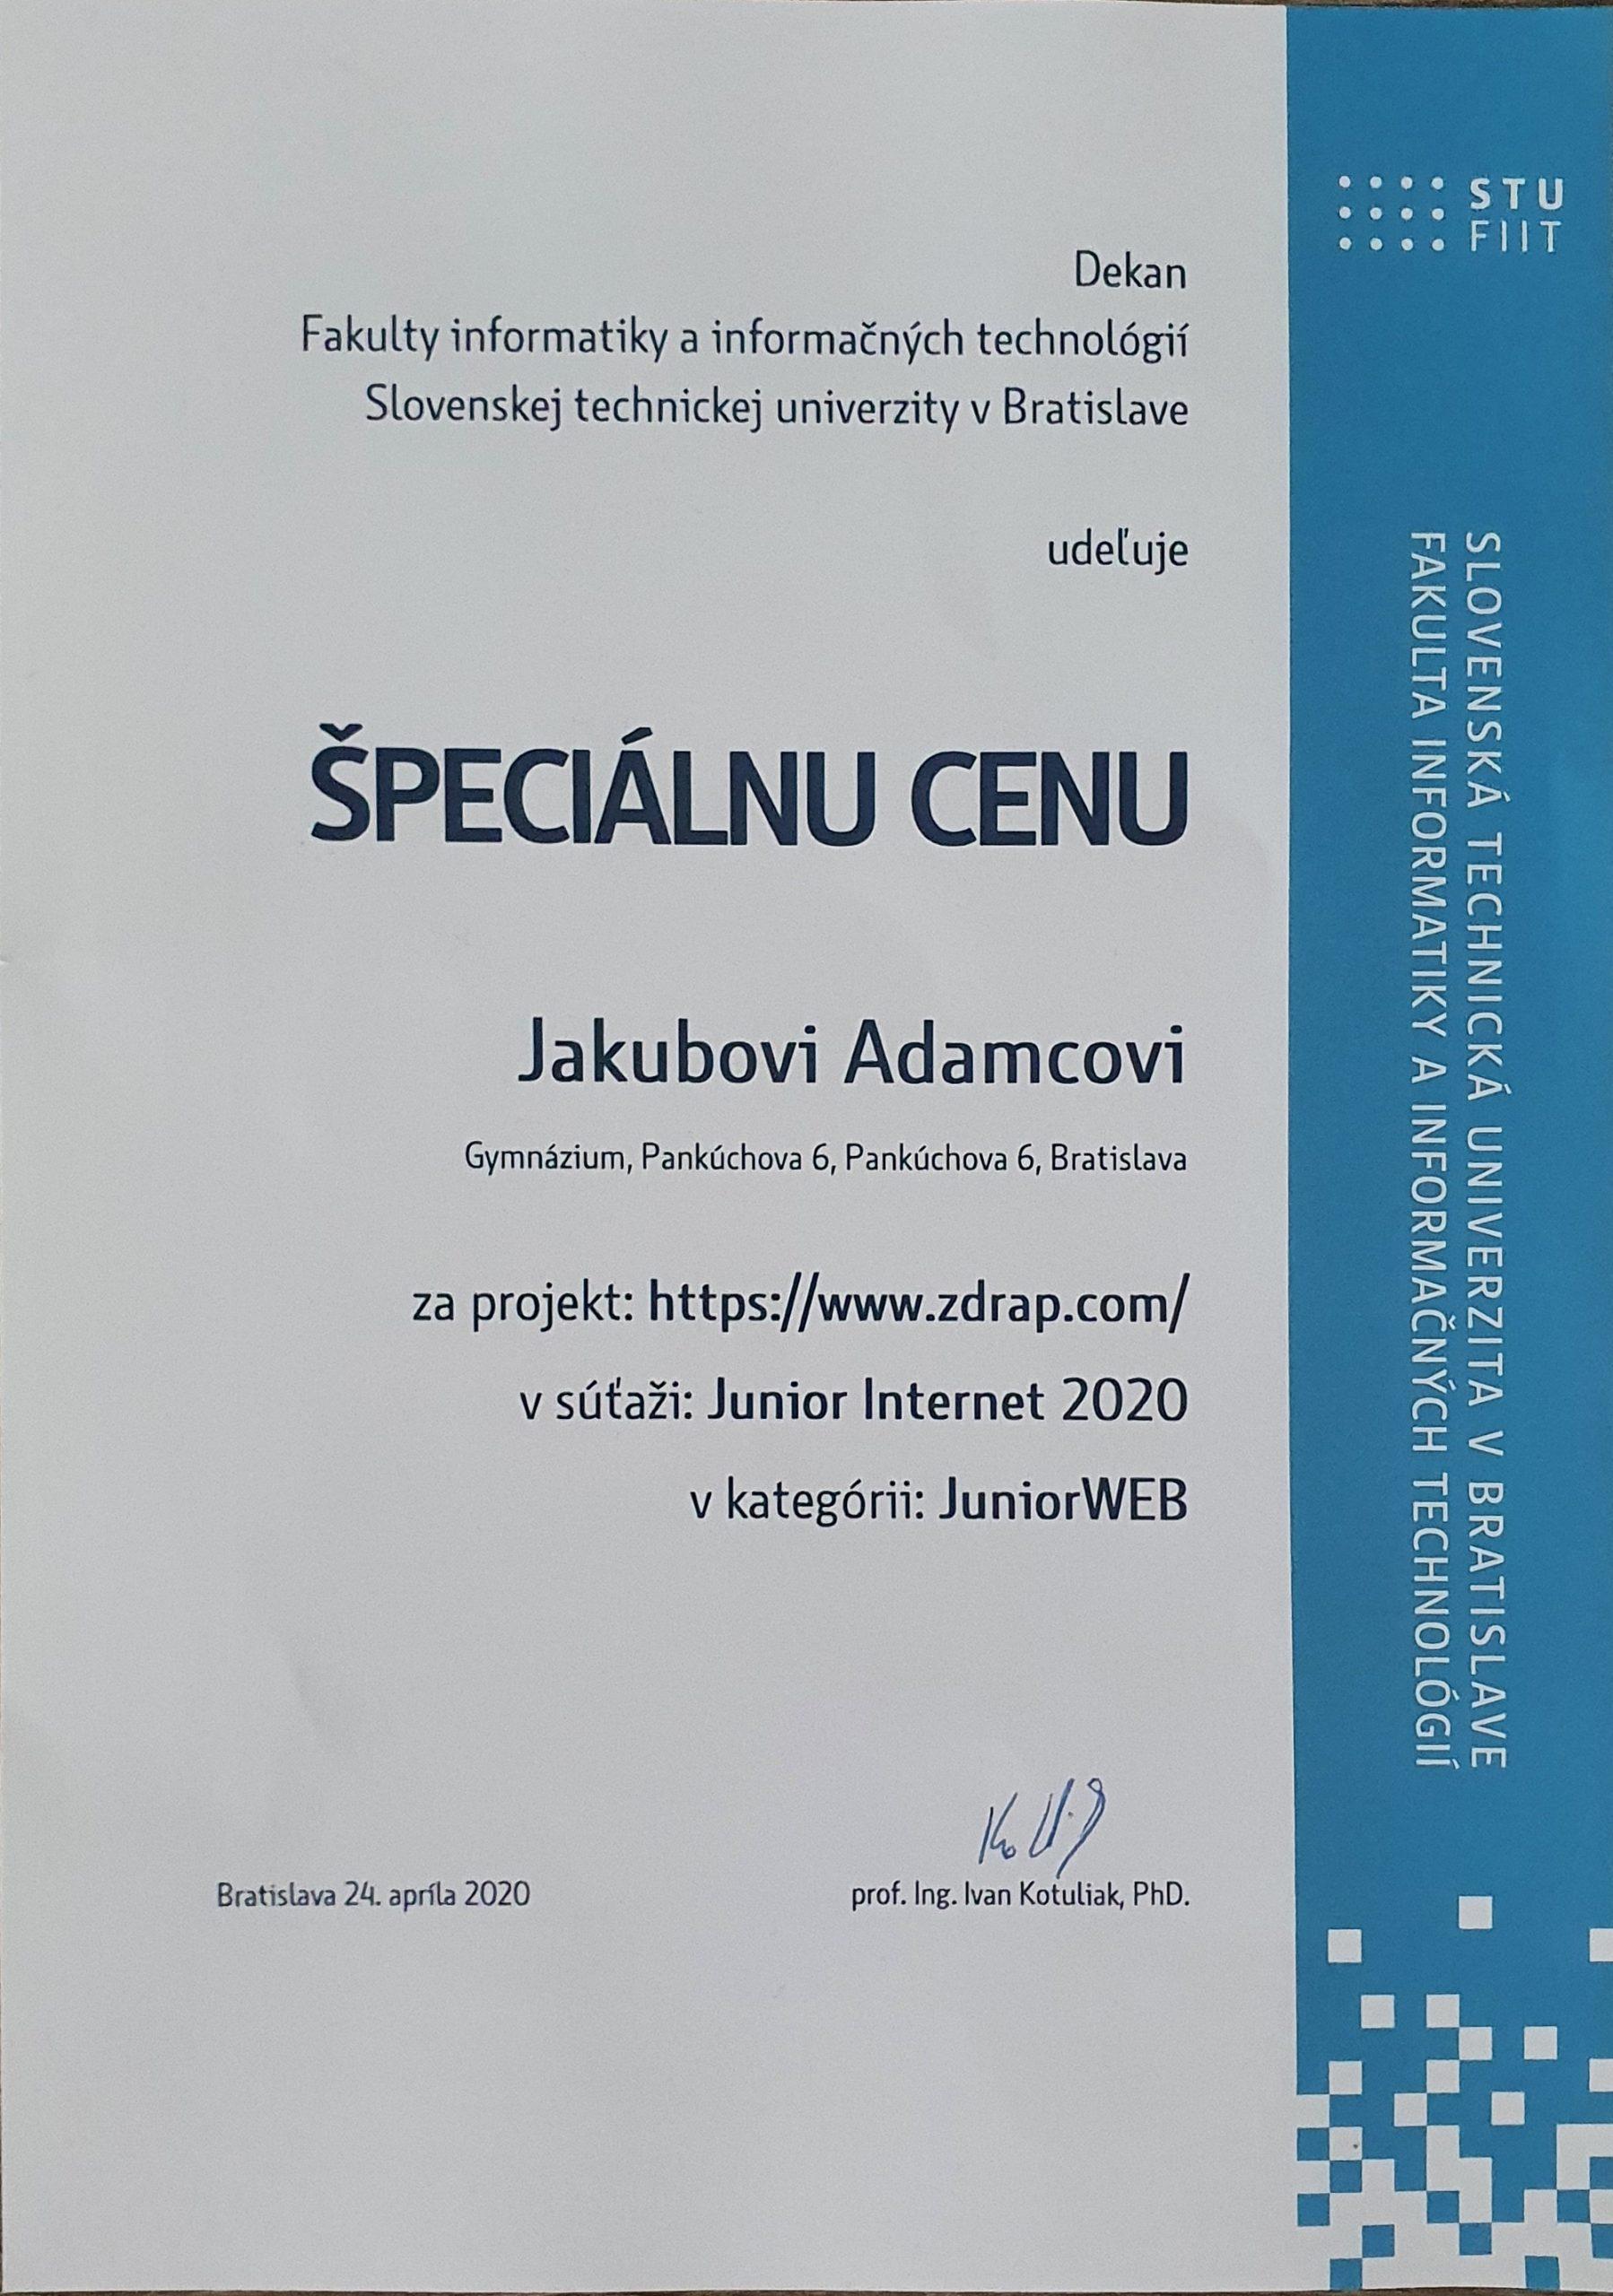 Dekan FIIT STU v Bratislave udeľuje Špeciálnu cenu